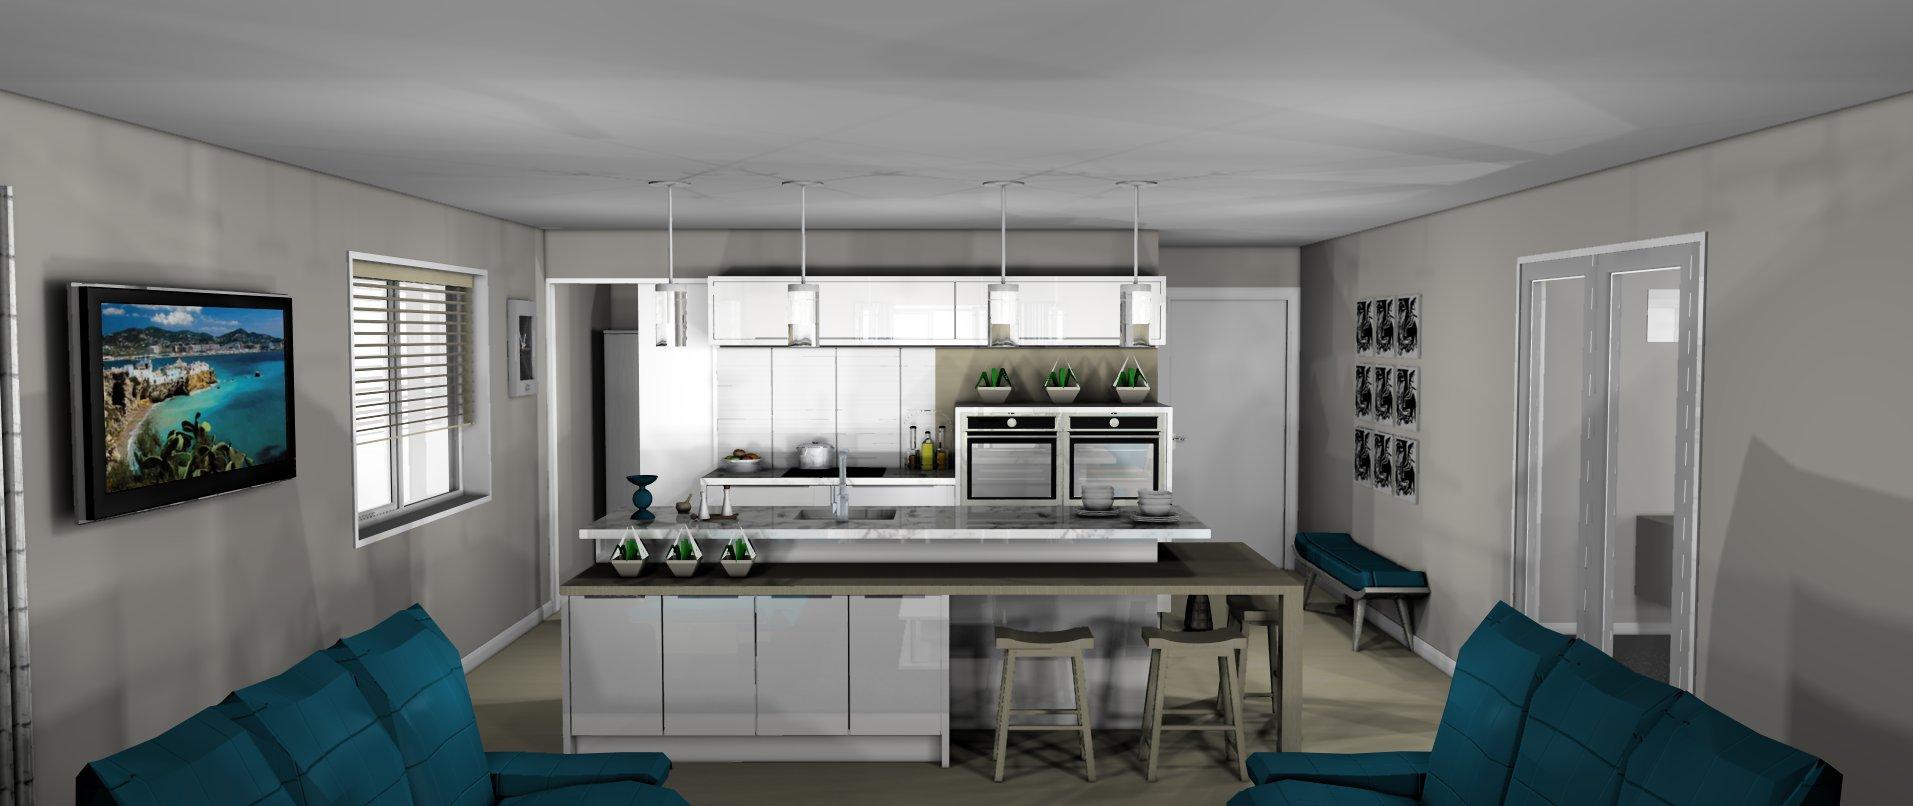 Kitchen Design Christchurch Best Free Home Design Idea Inspiration